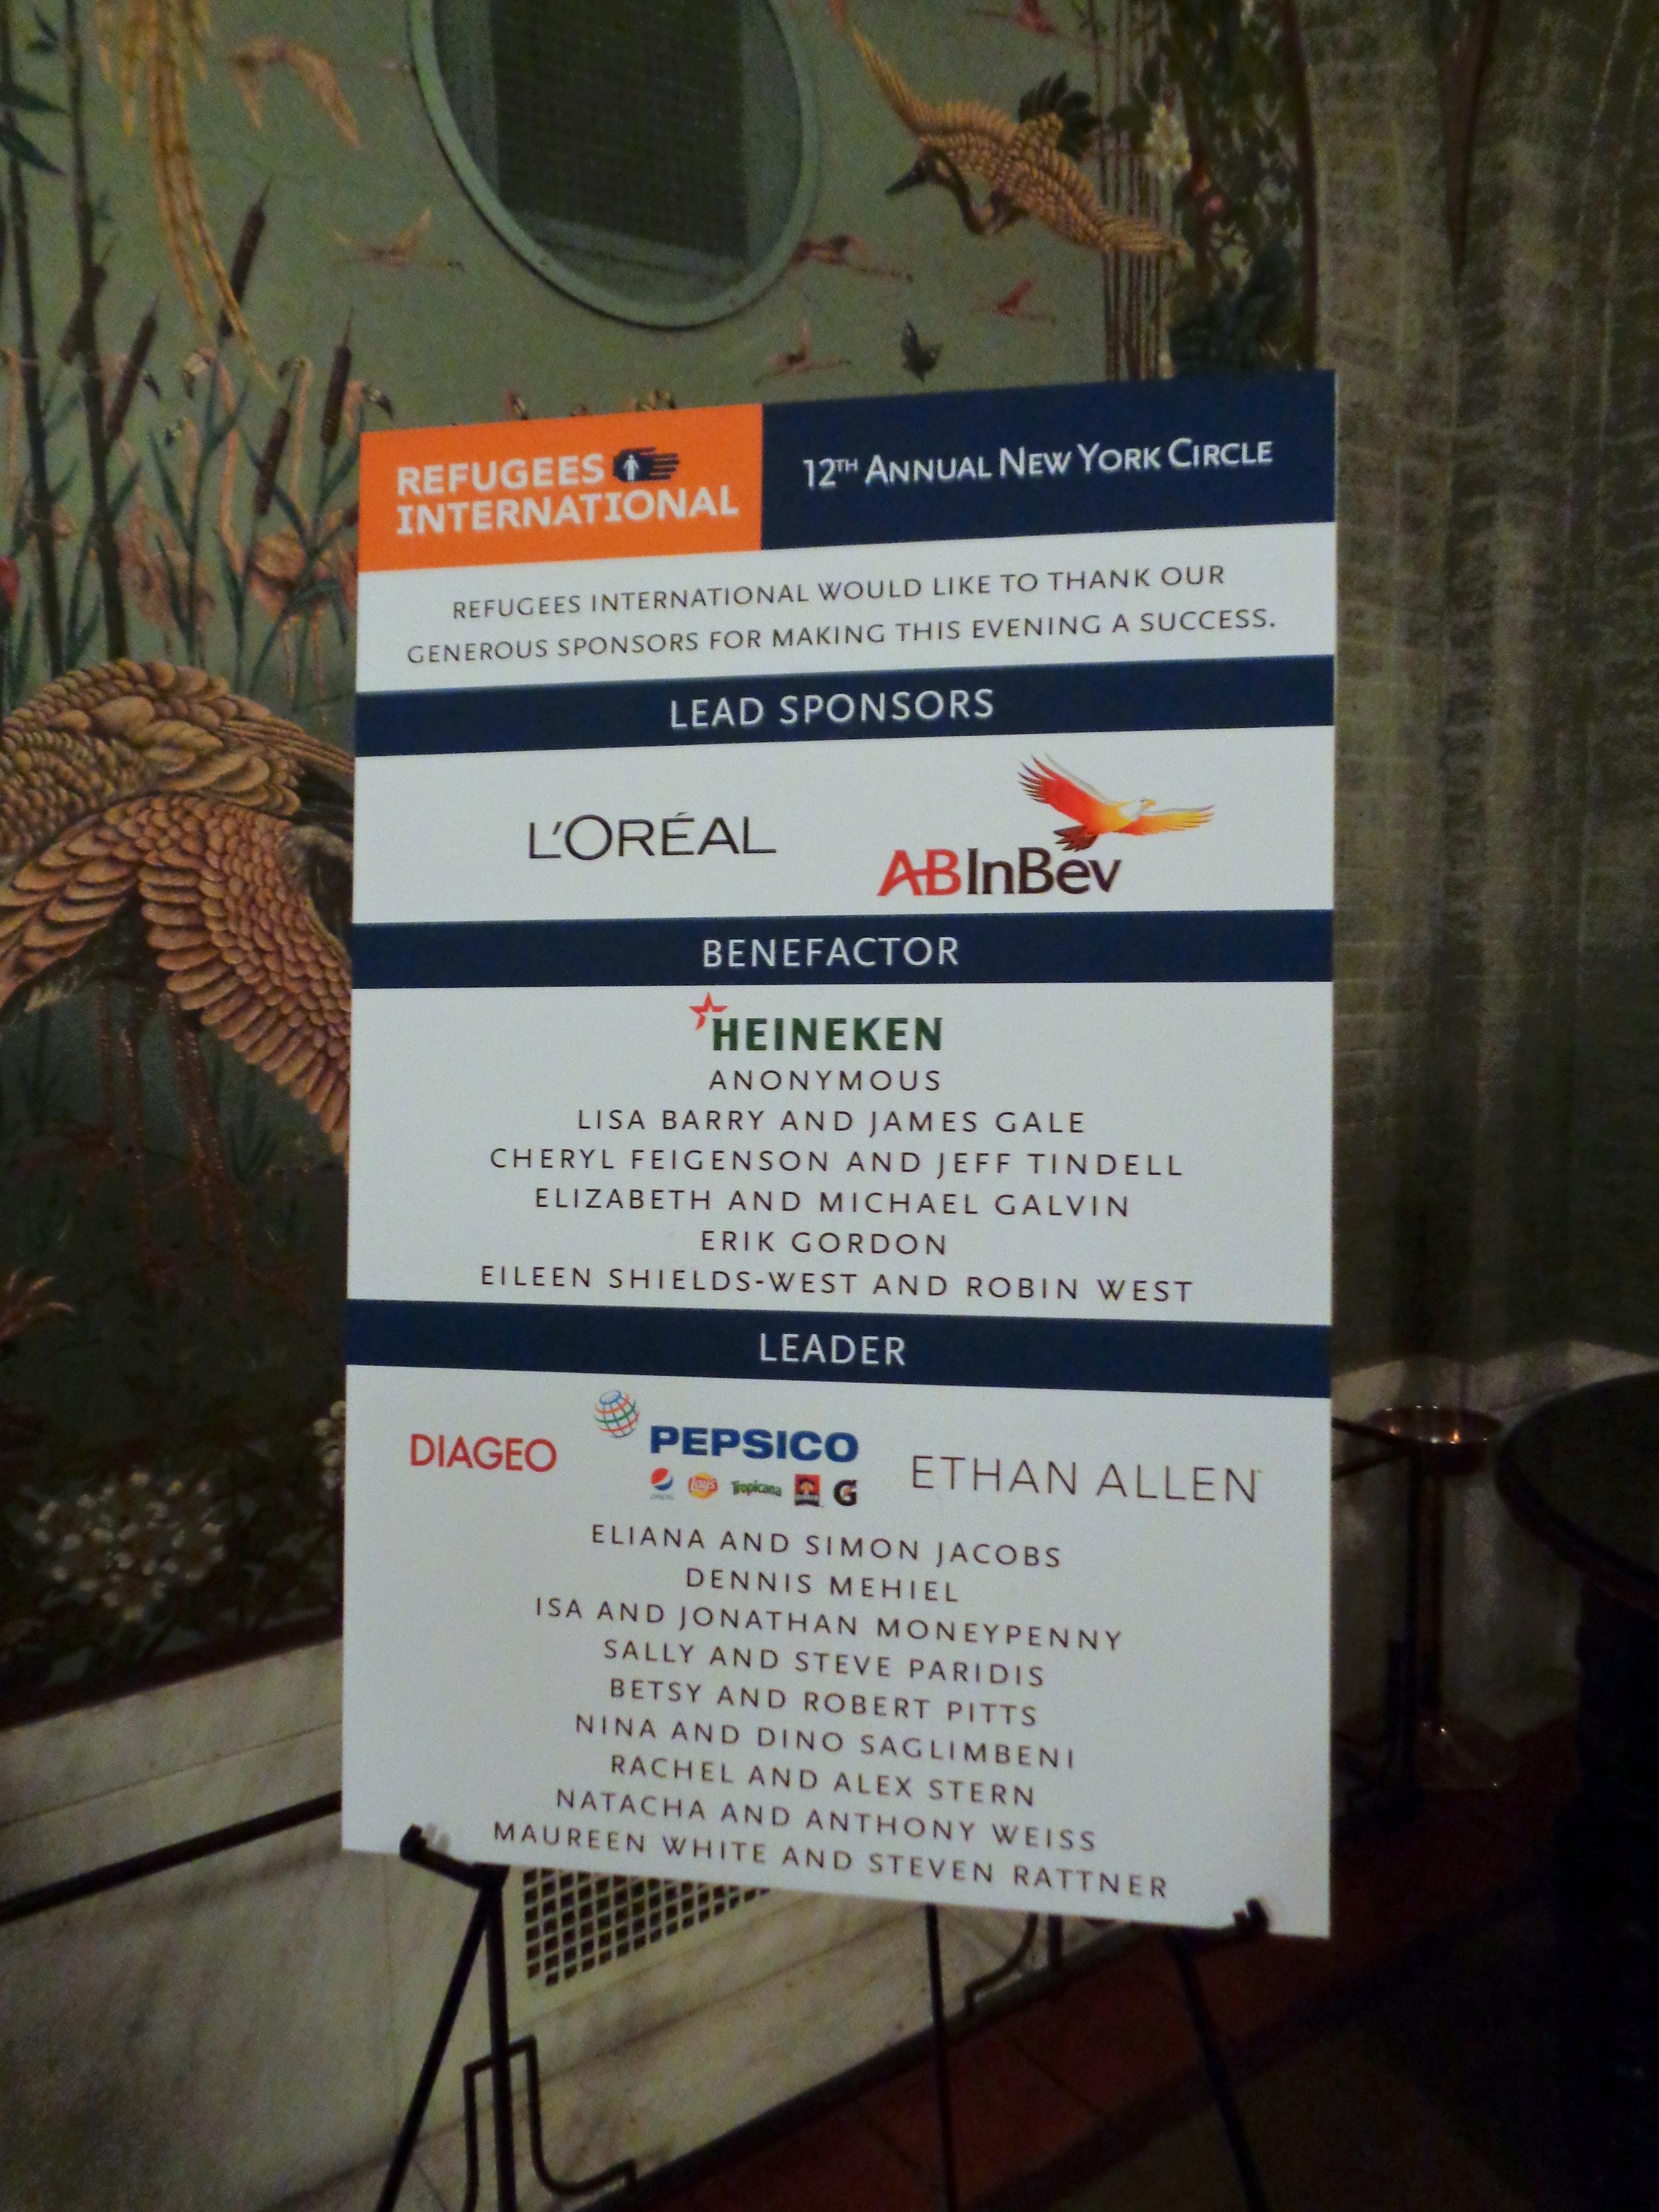 The evening's sponsors